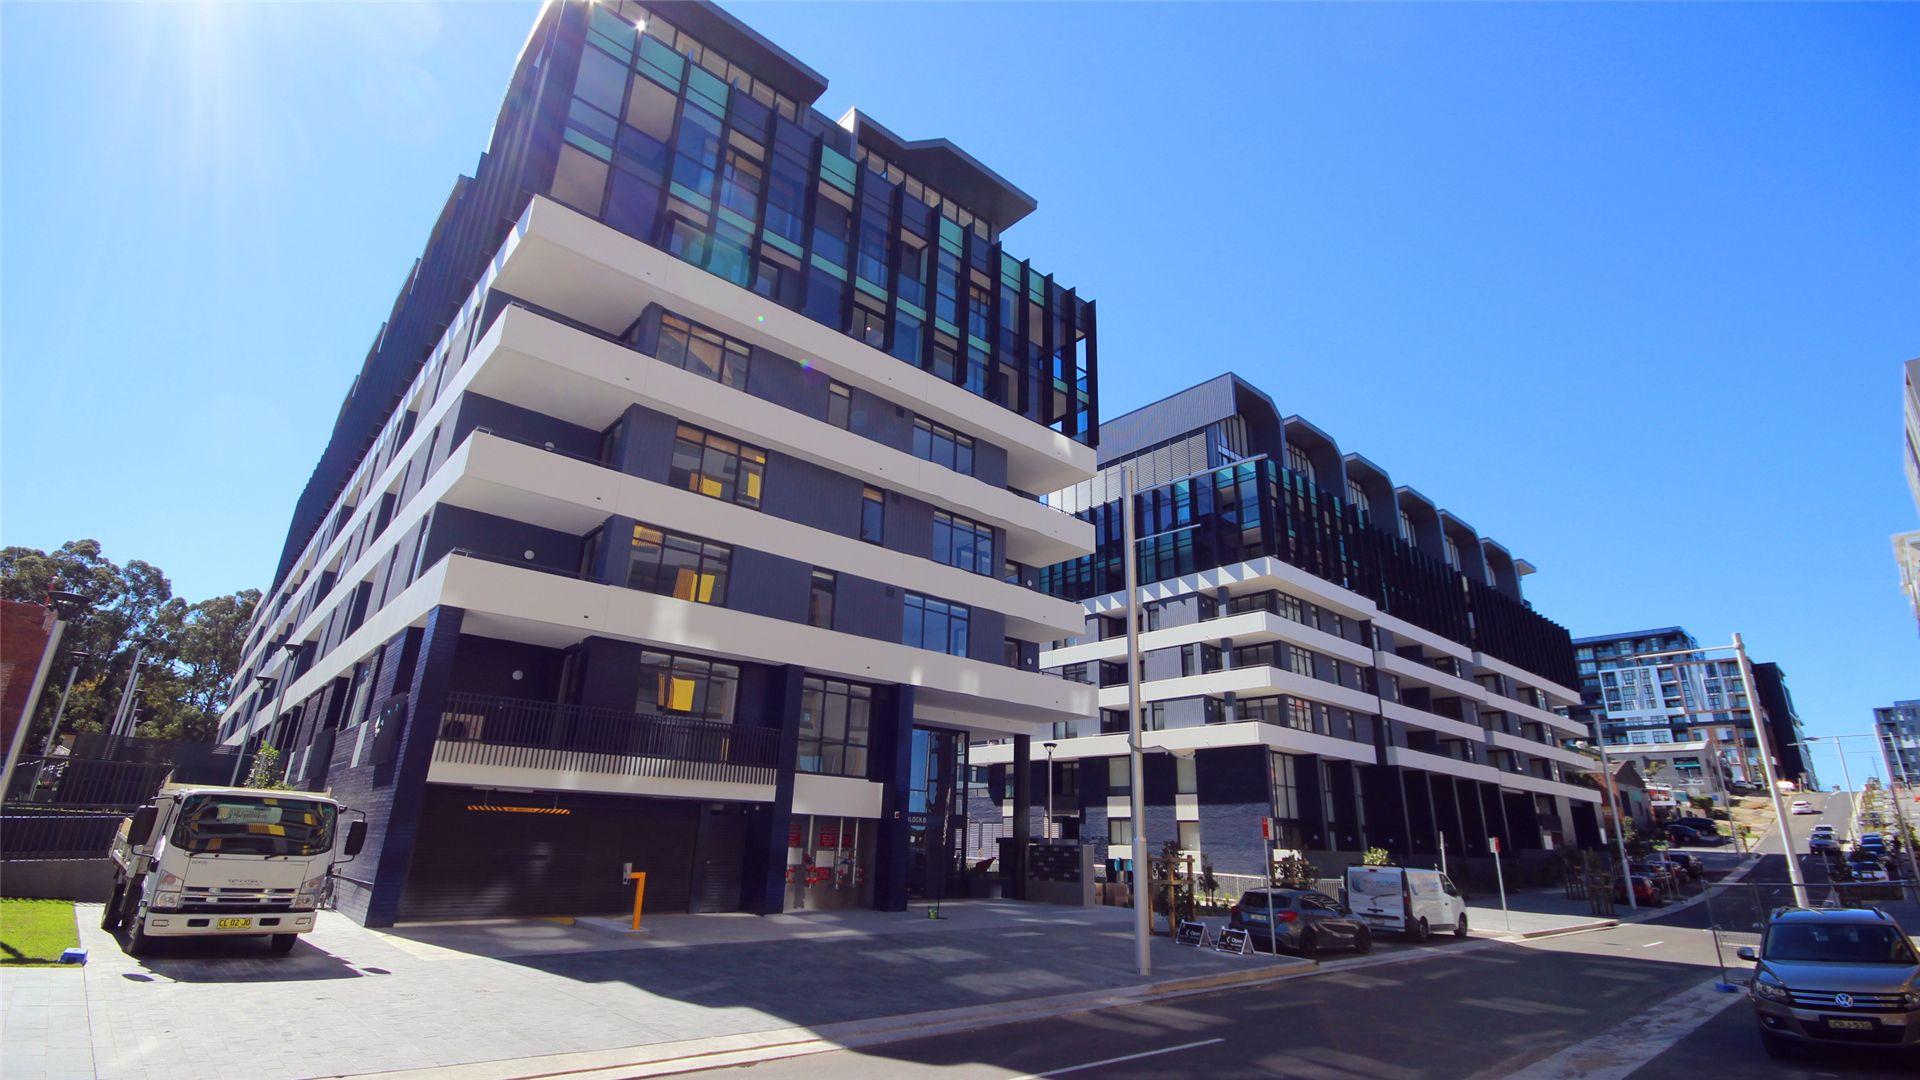 53 Nancarrow Ave, Ryde NSW 2112, Image 0